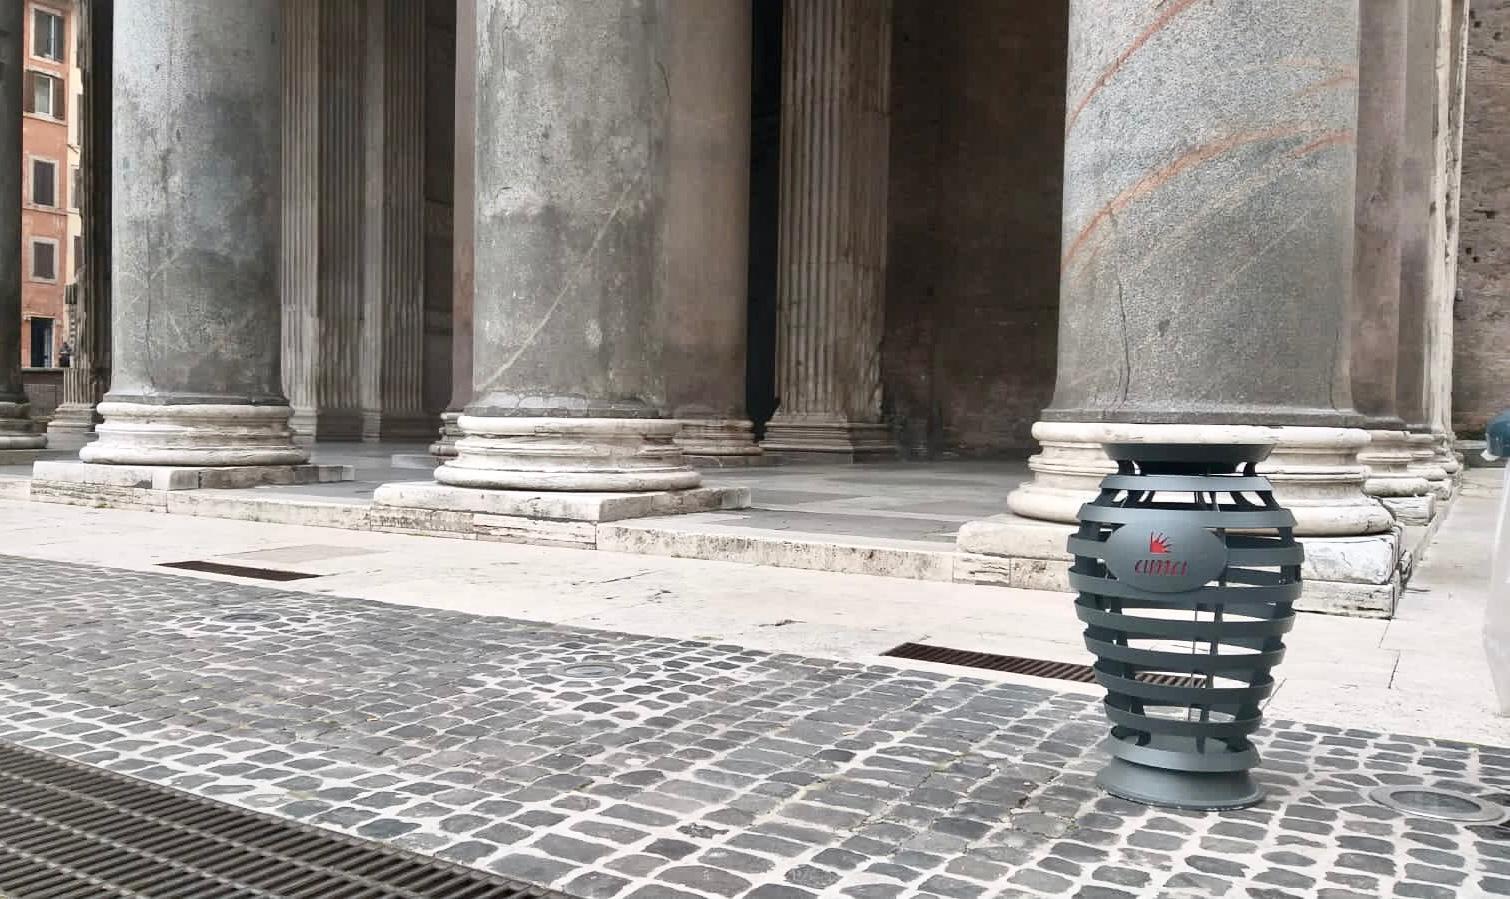 ROMA - Arrivano i nuovi cestini per i rifiuti